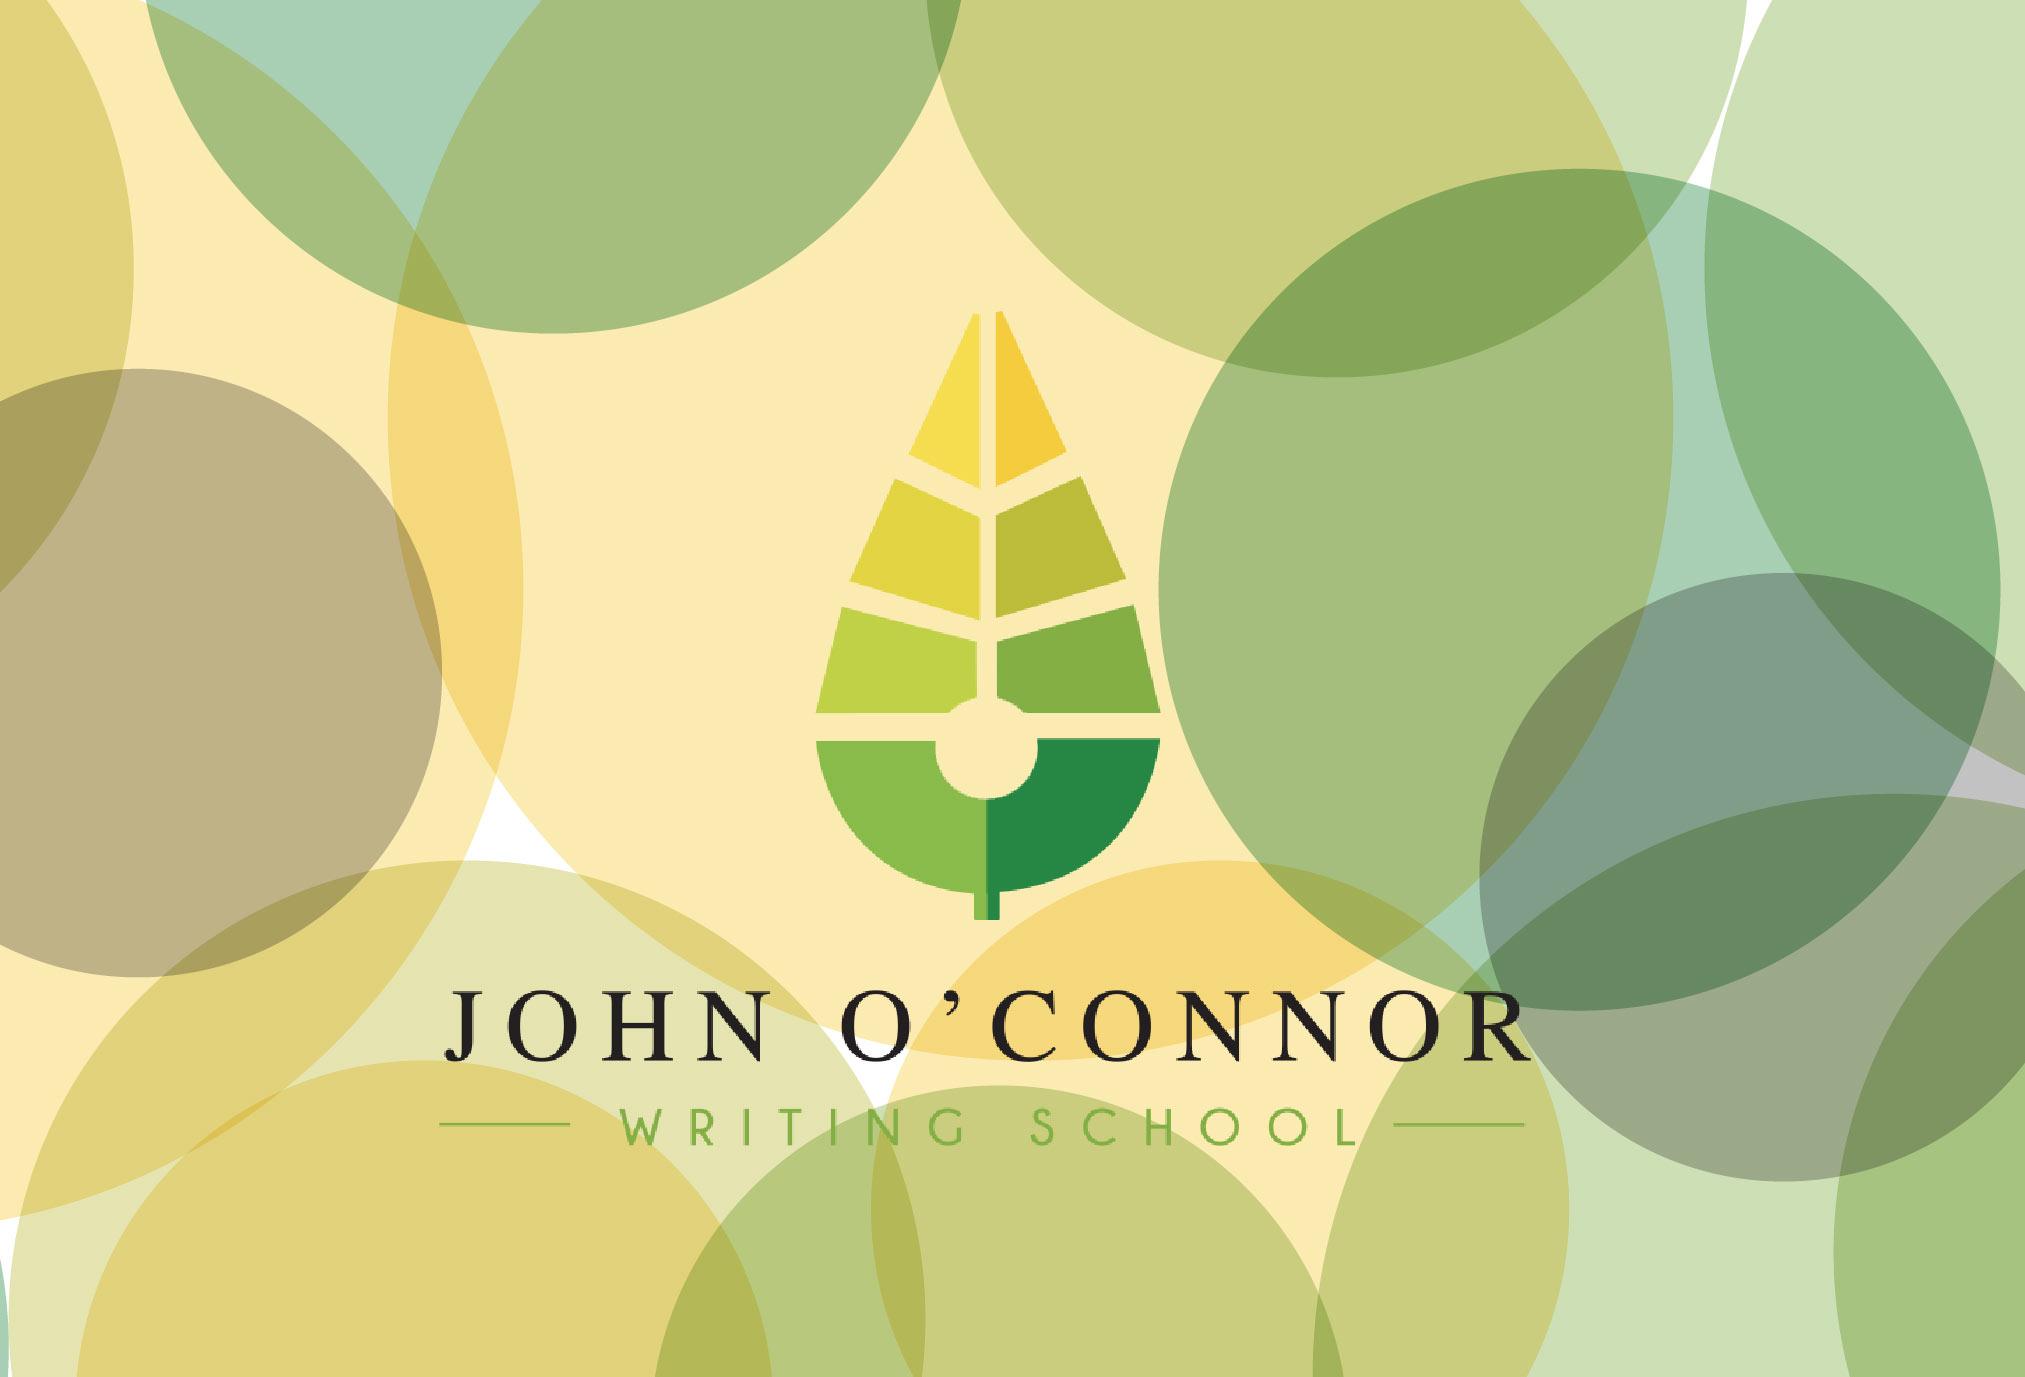 JOHN O'CONNOR WRITING SCHOOL: 2 – 5 NOV